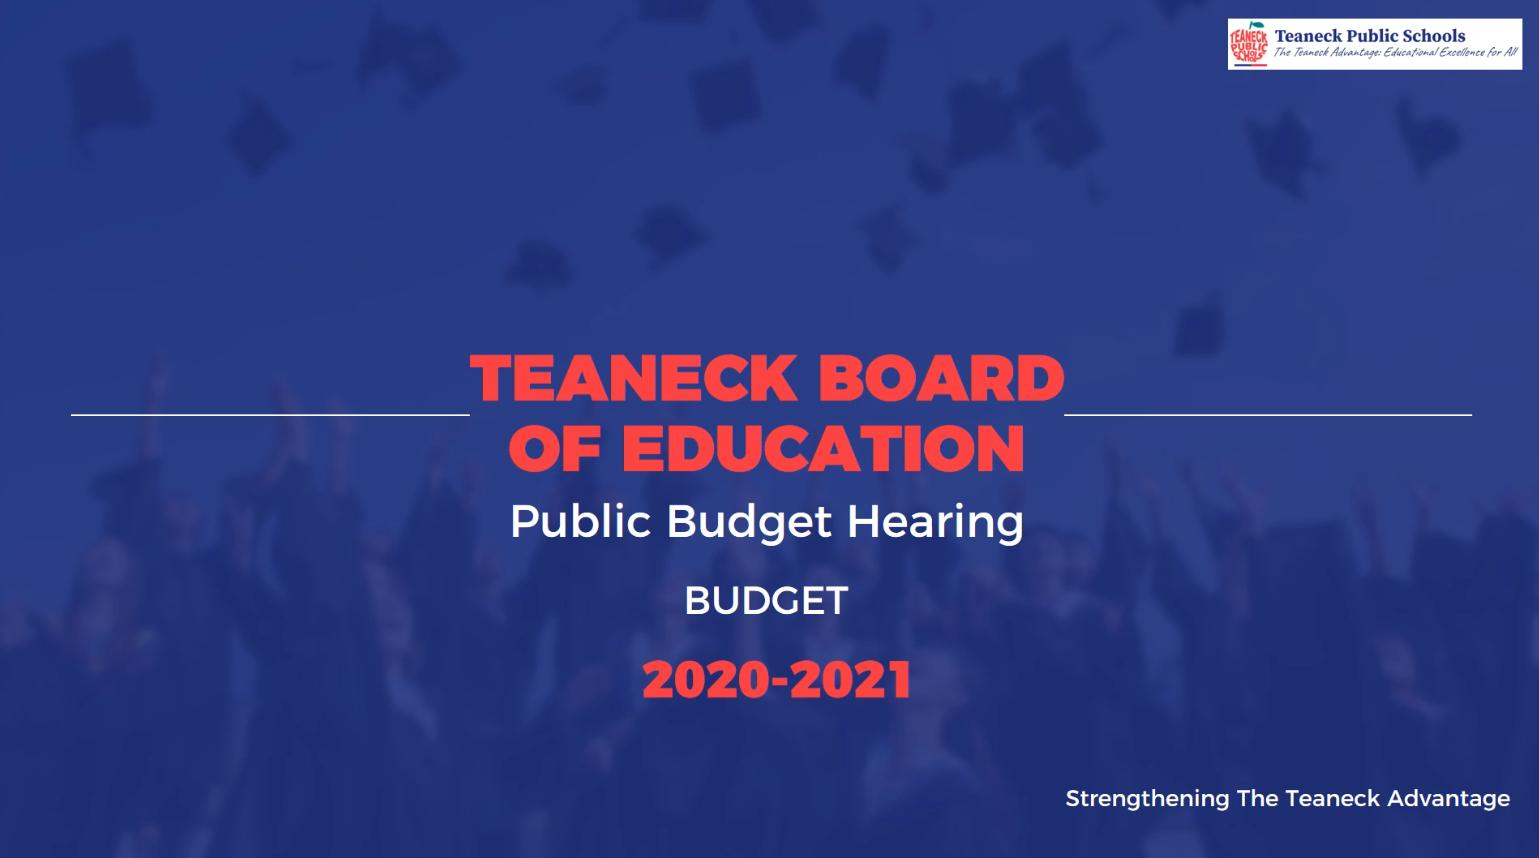 Budget Hearing 2020-2021